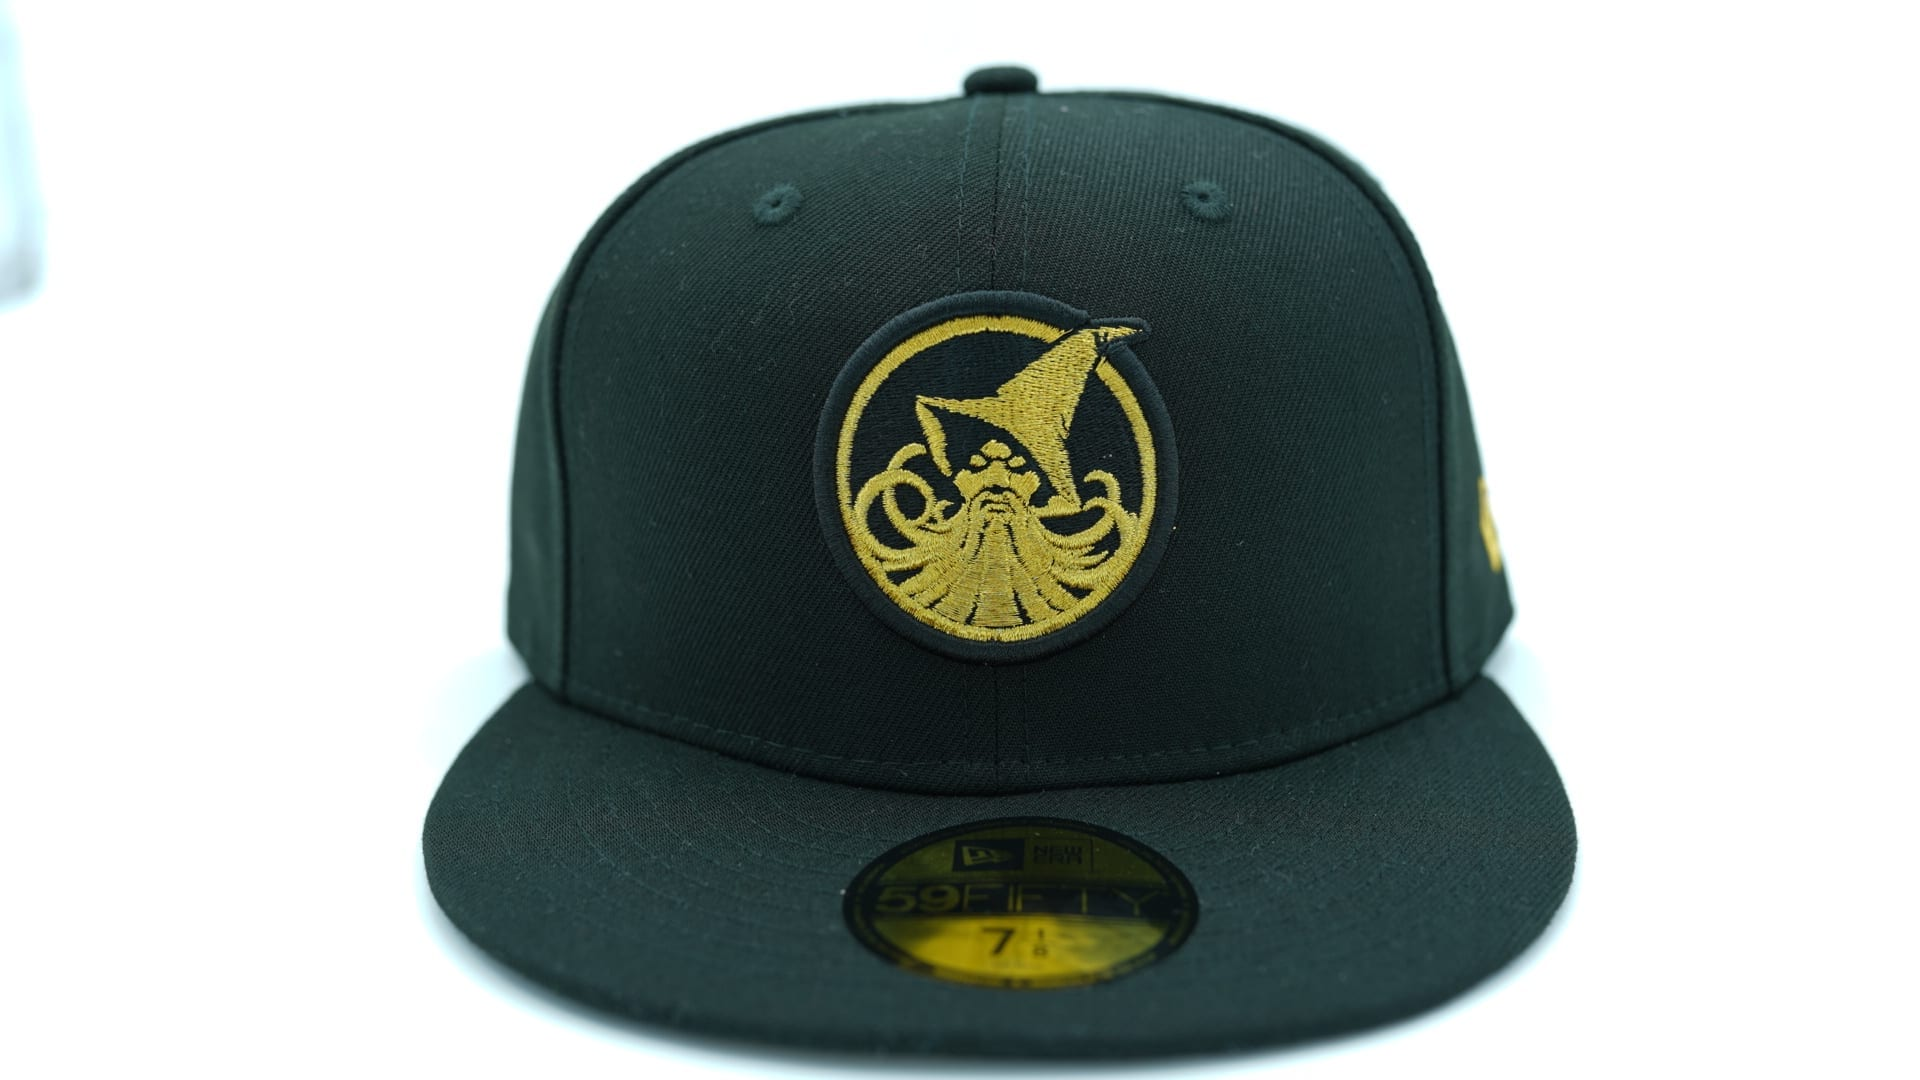 college fitted wool hat cap texas longhorns baseball team longhorn caps uk stadium capacity